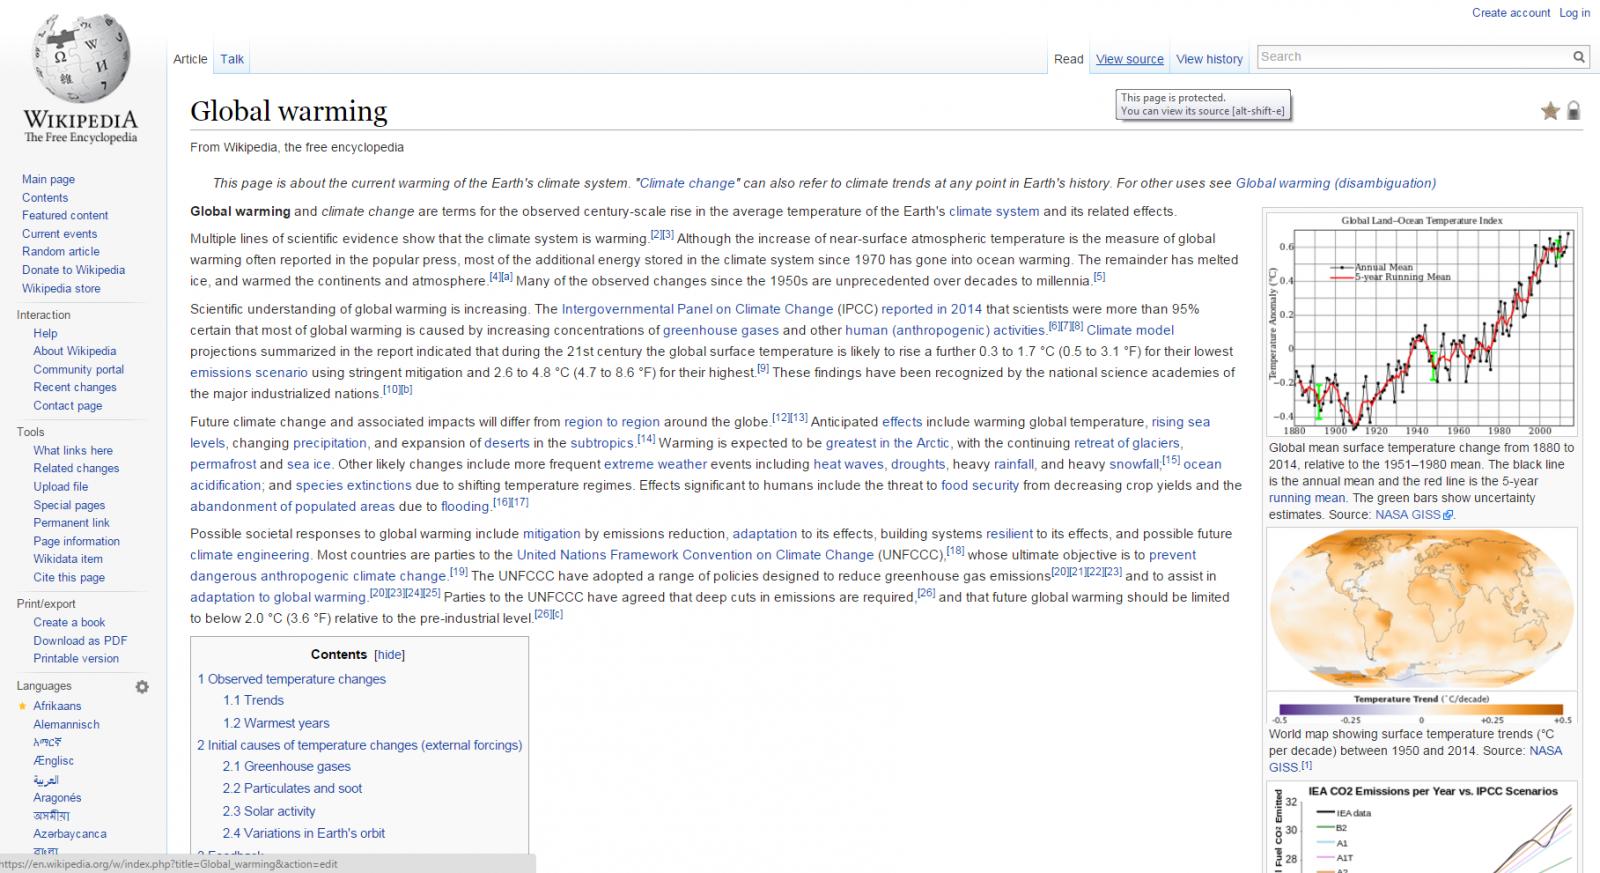 Wikipedia Global Warming page